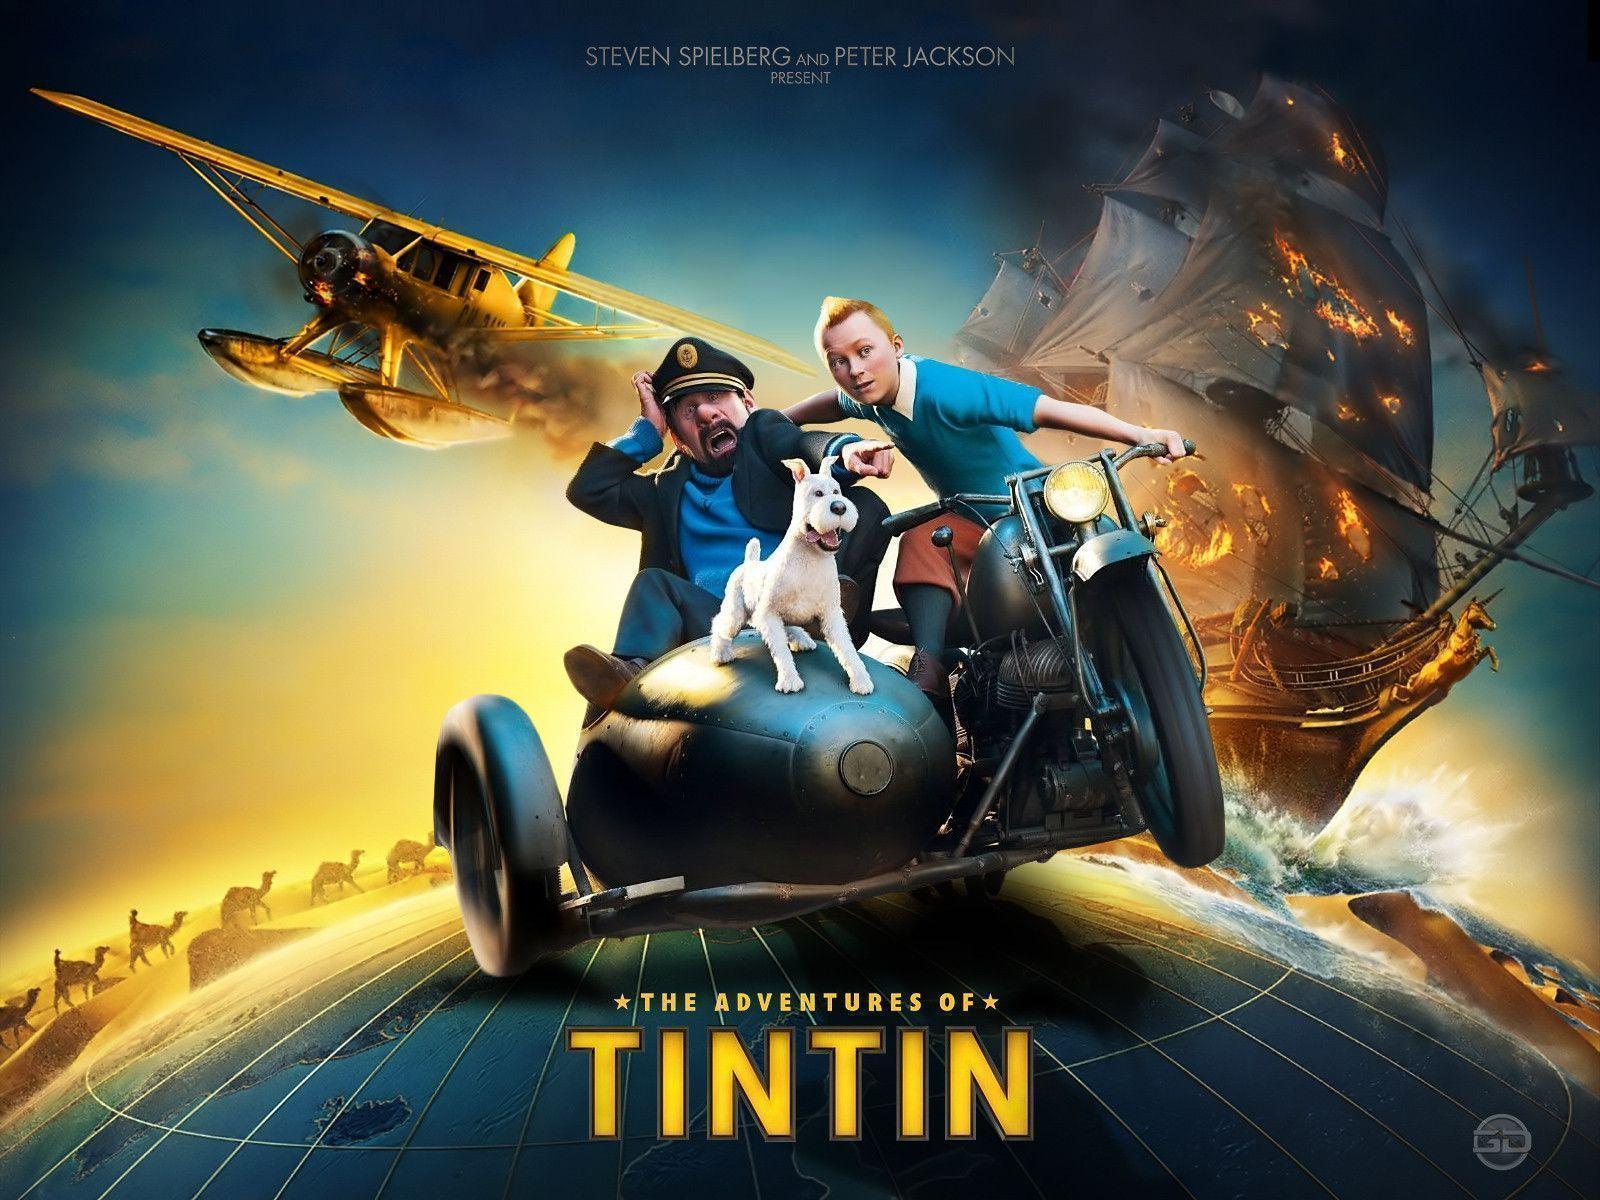 Adventure Of Tintin Movie List